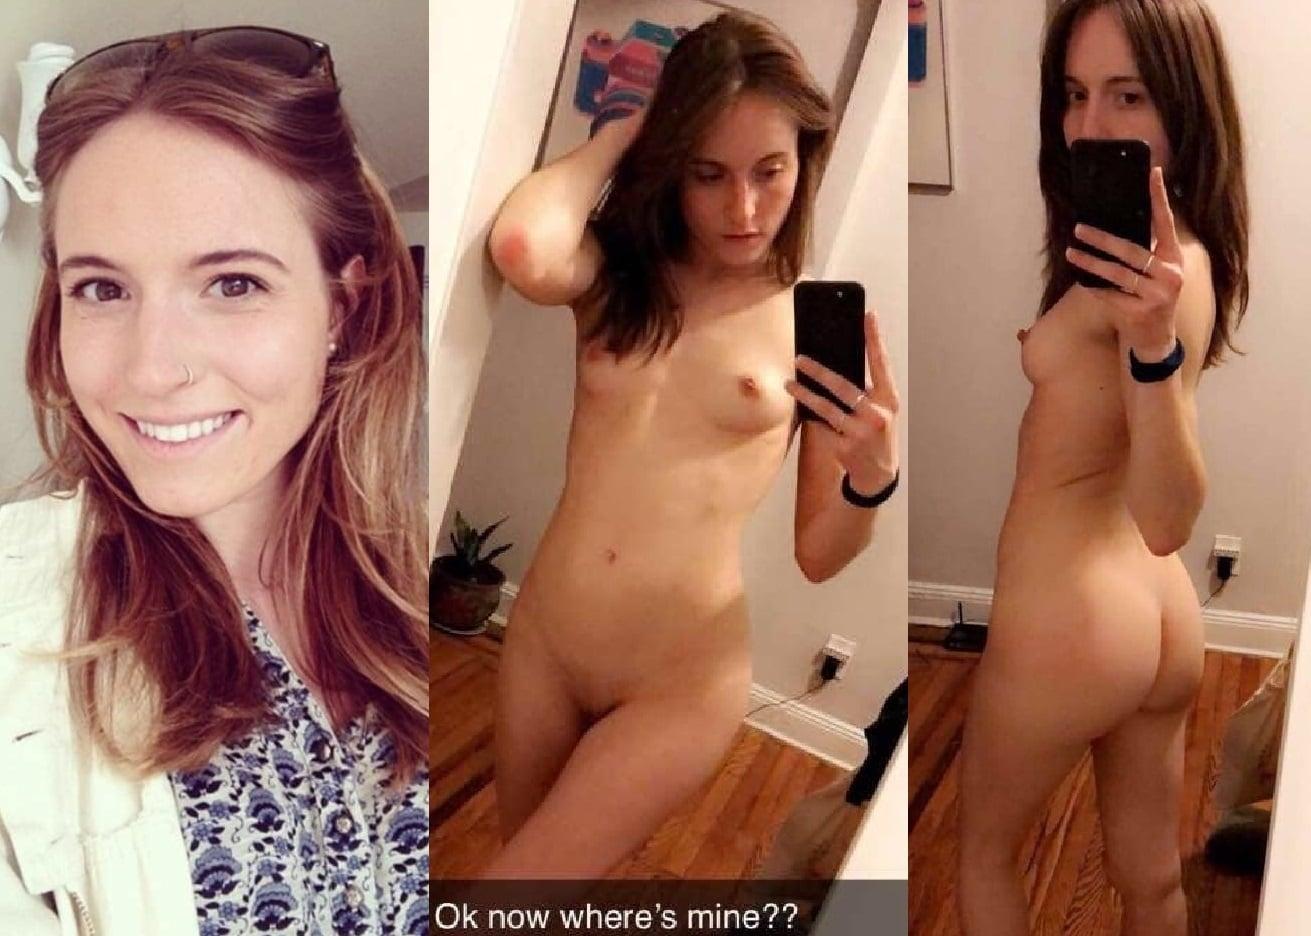 https://sexyna.org/wp-content/uploads/2019/12/Holky-před-a-po-09.jpg